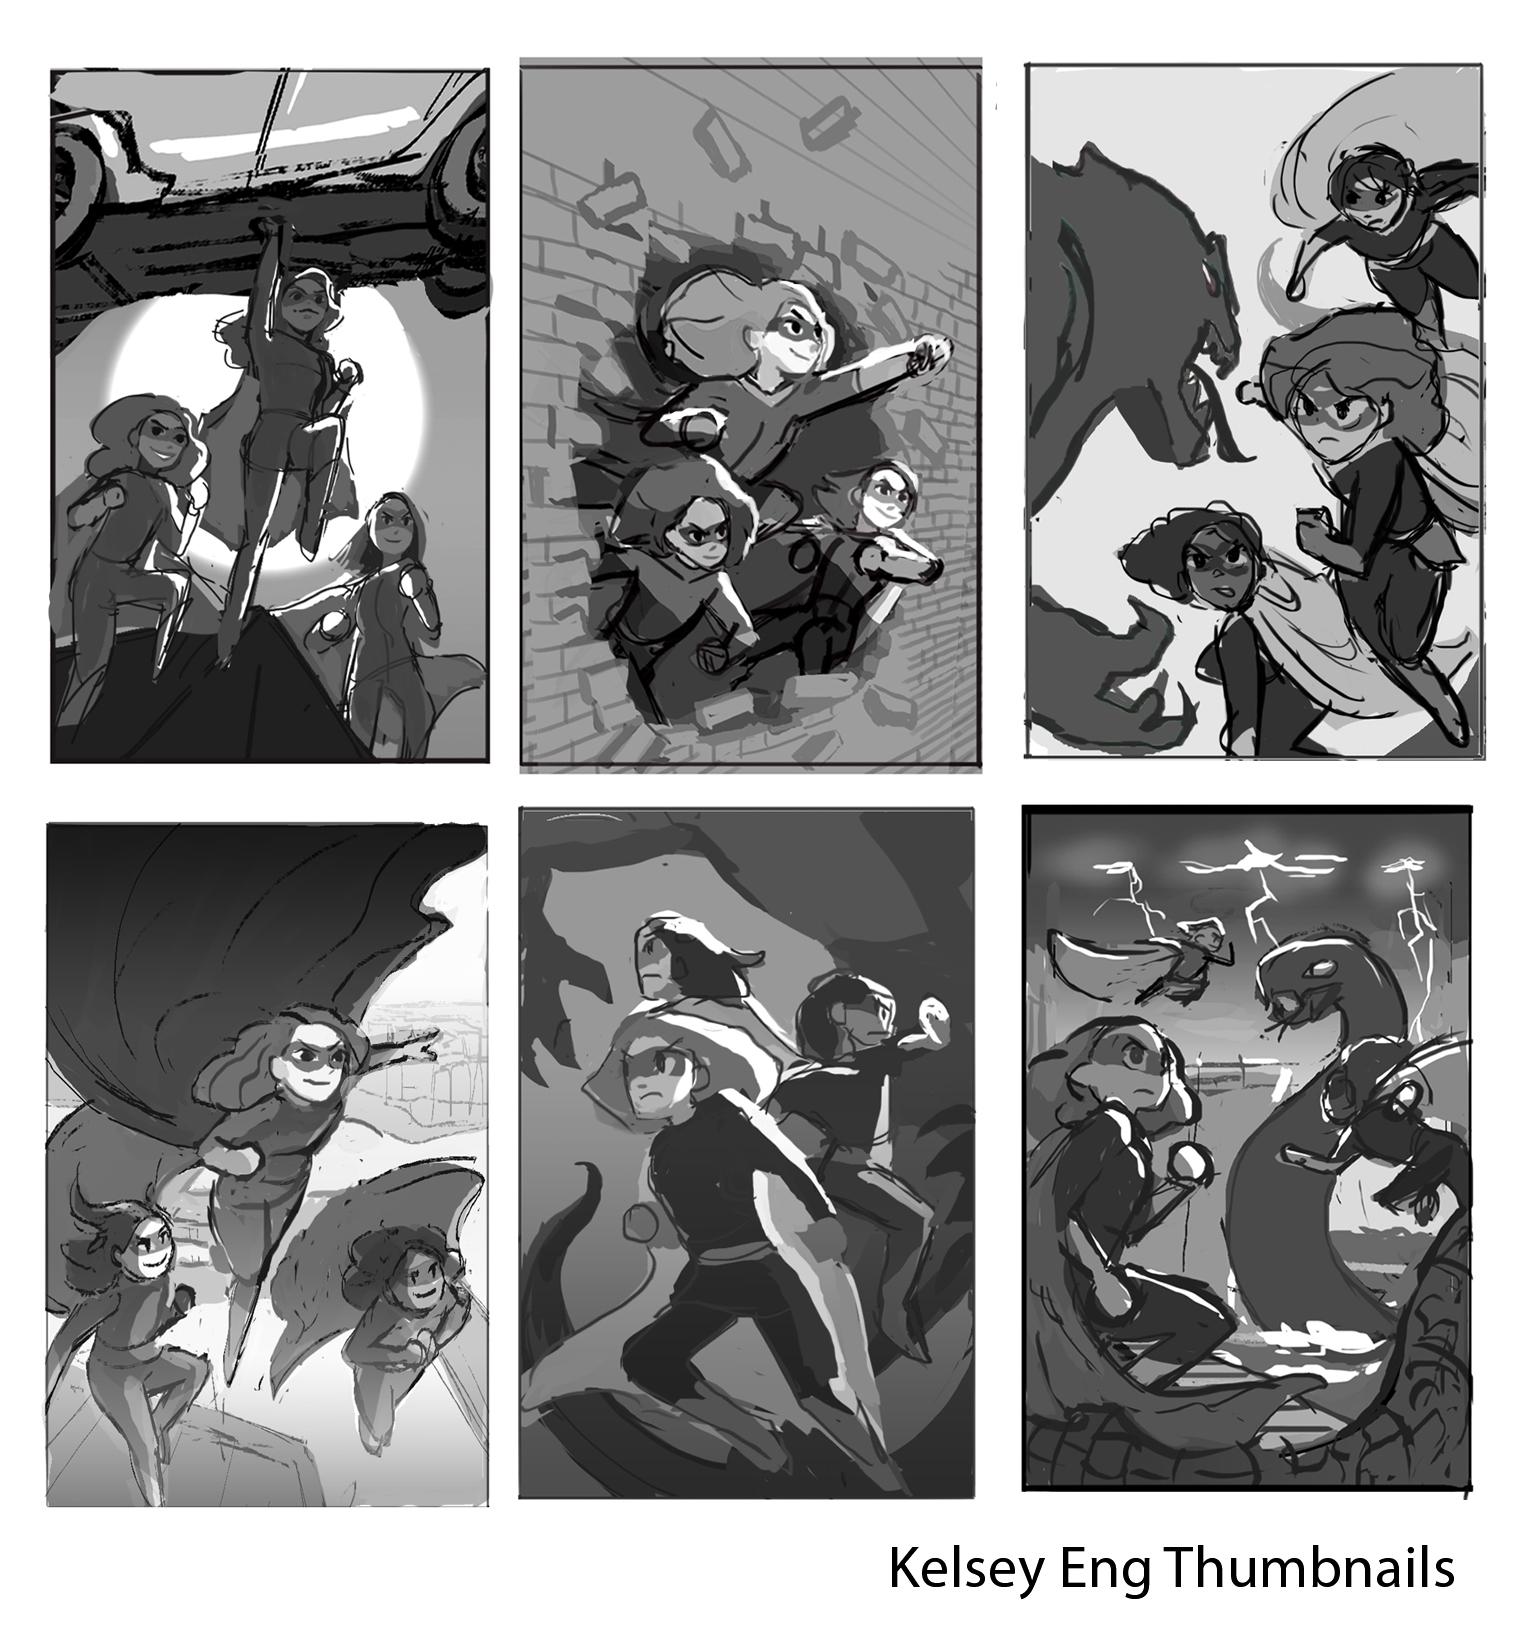 kelsey-eng-thumbnails.jpg